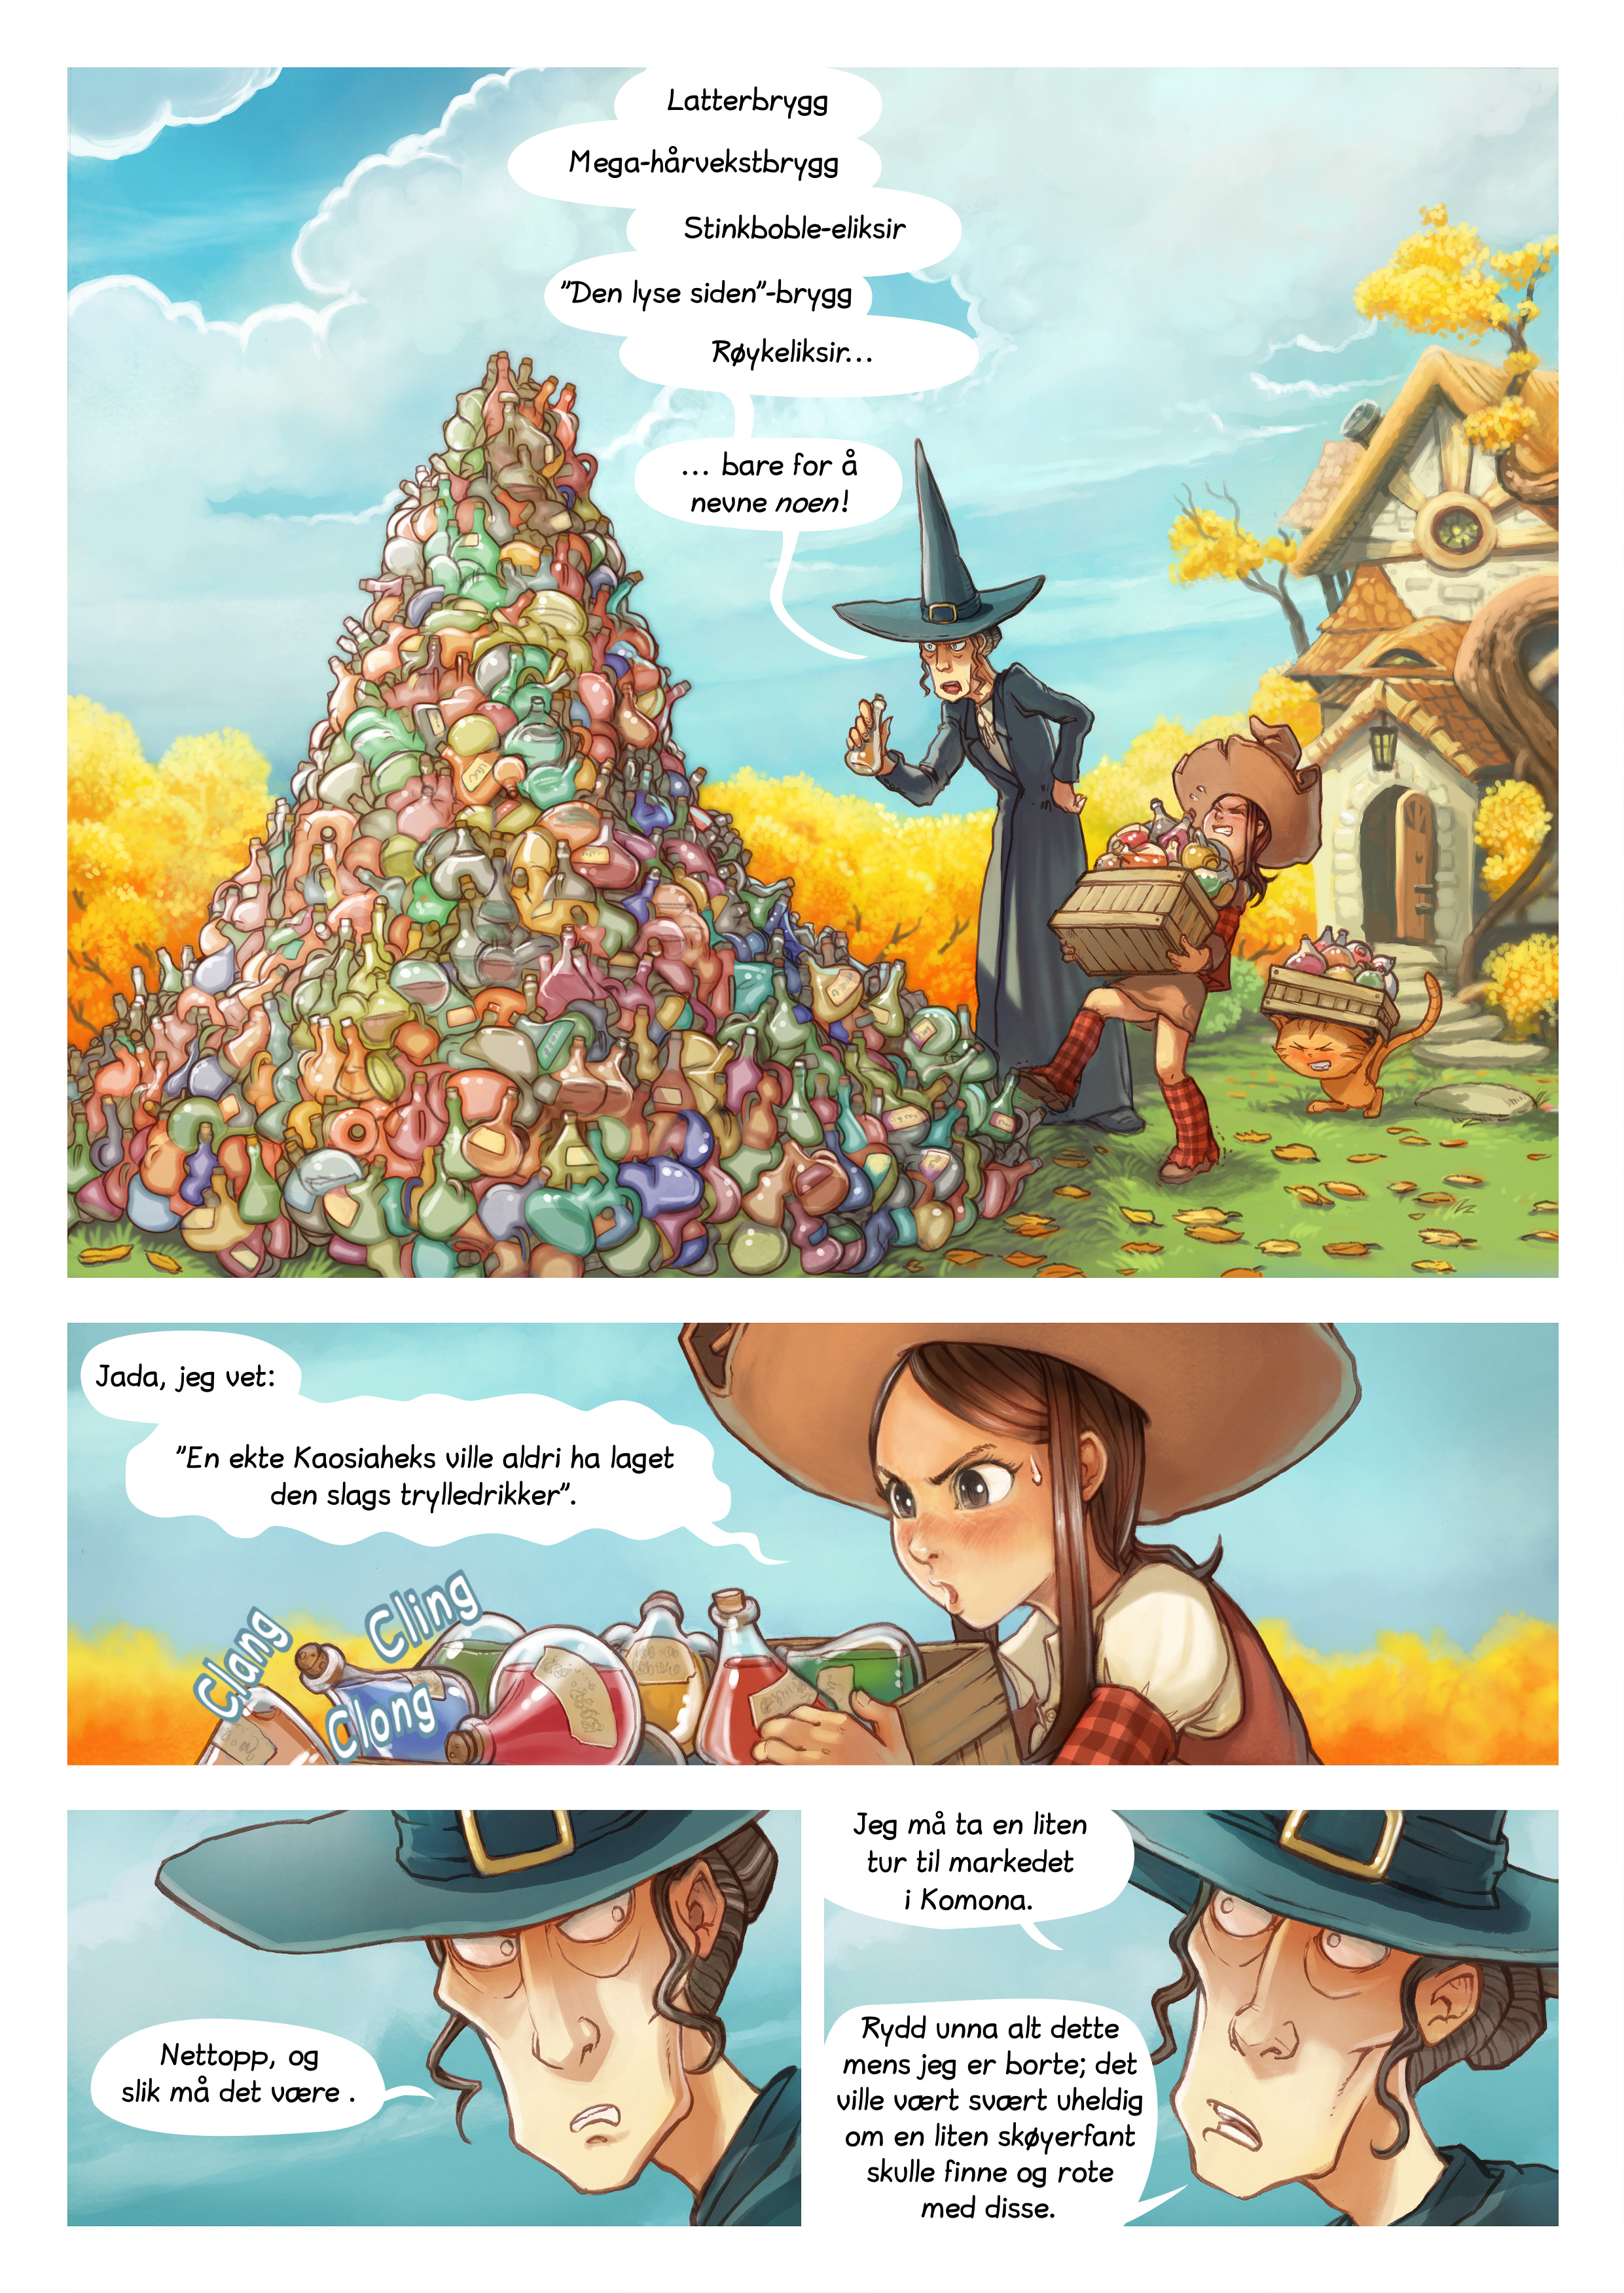 Episode 12: Høstrengjøring, Page 1